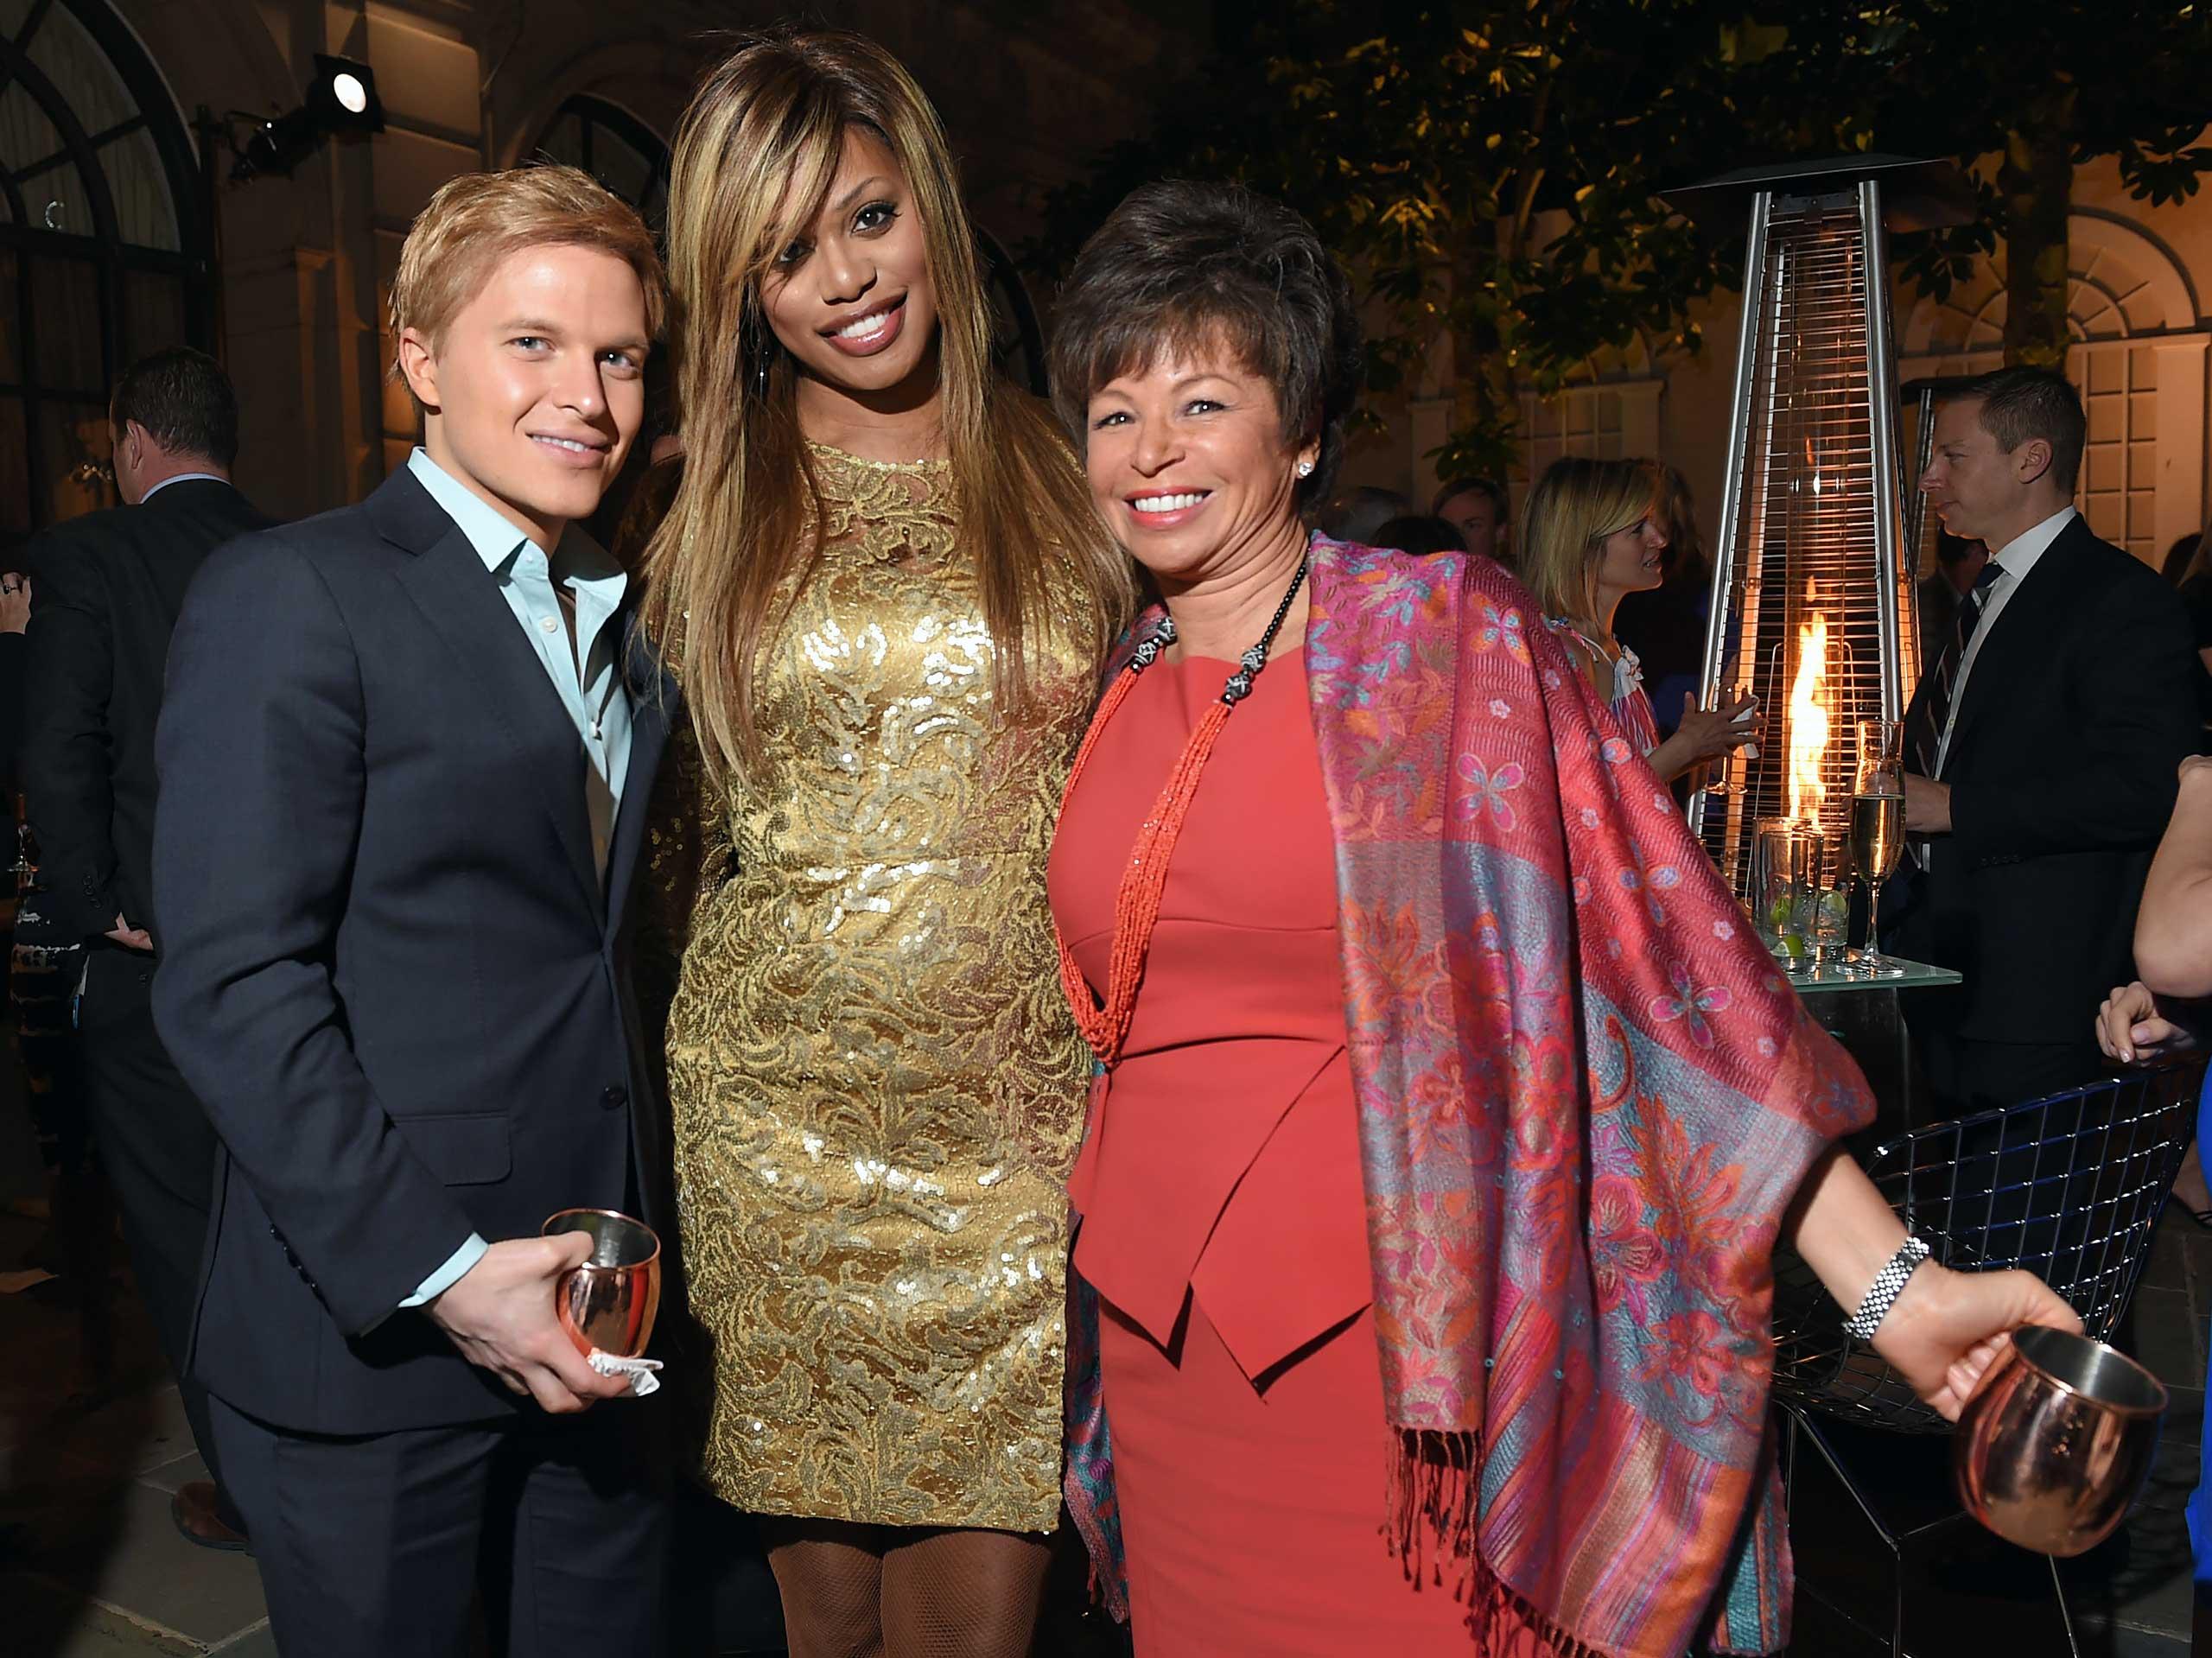 MSNBC's Ronan Farrow, Actress Laverne Cox and Senior Advisor to President Obama, Valerie Jarrett